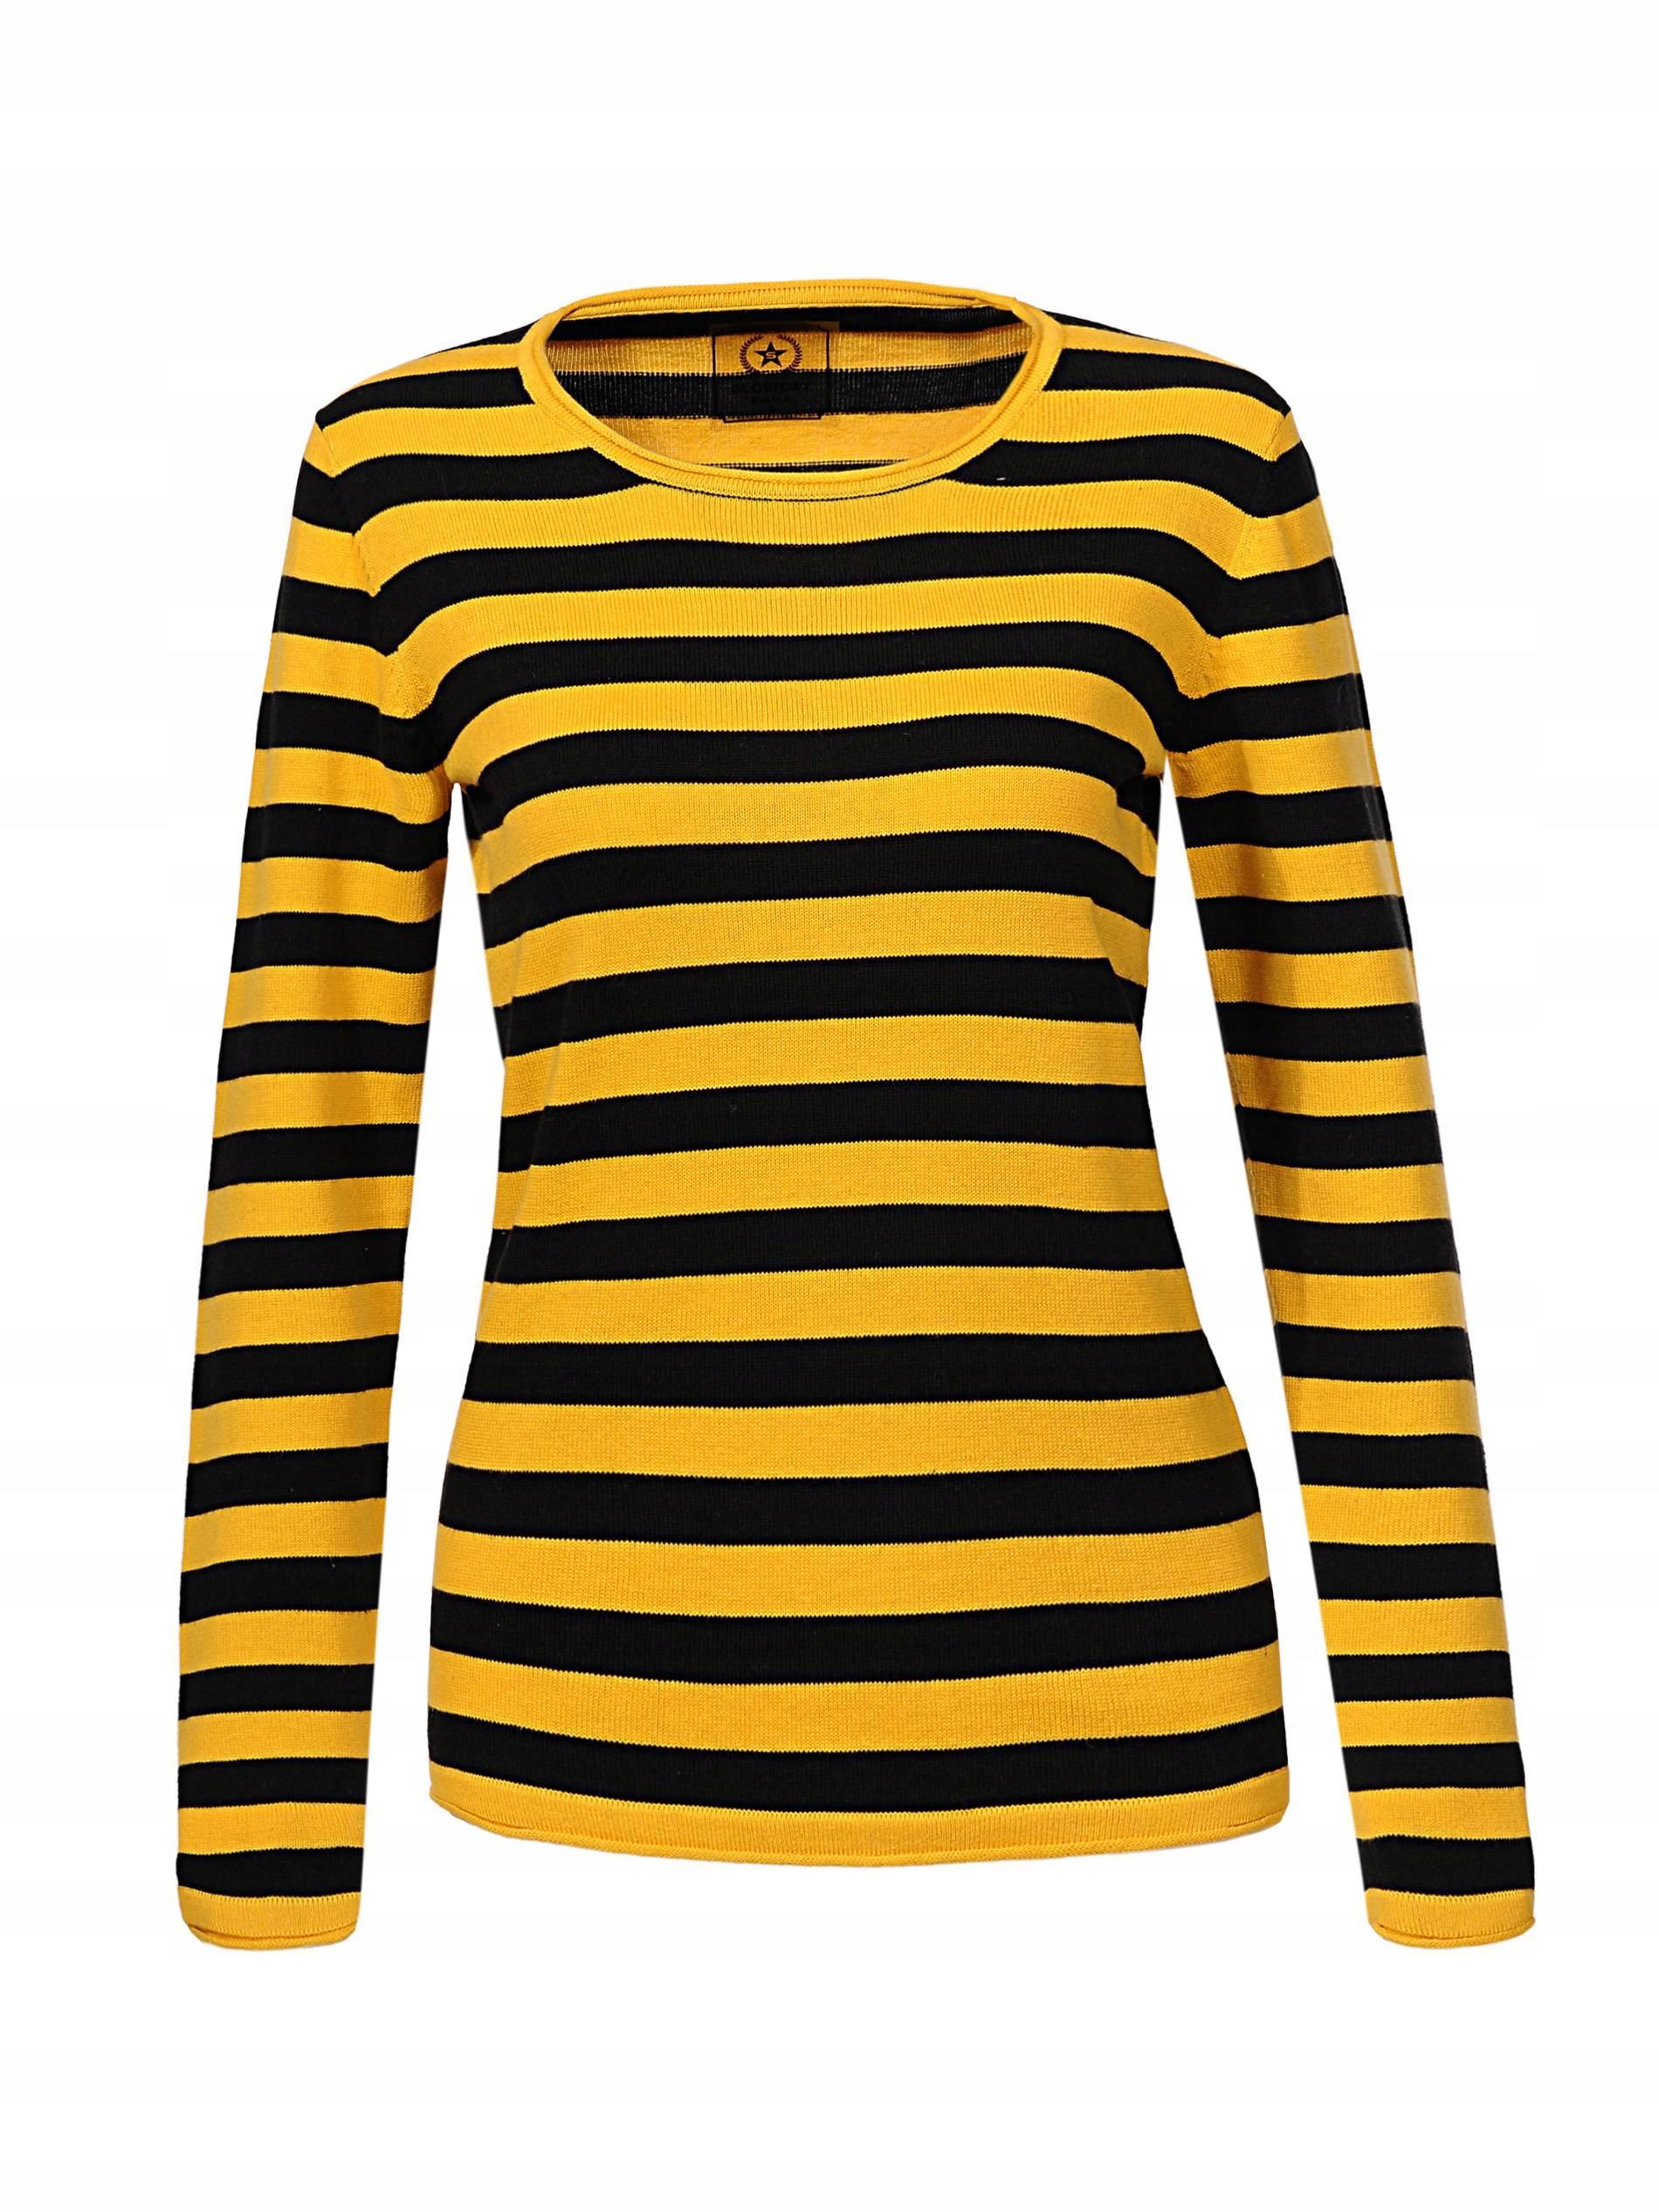 d725721a87544b SWETER DAMSKI W PASKI sweterek żółty paski s - 7713962307 ...